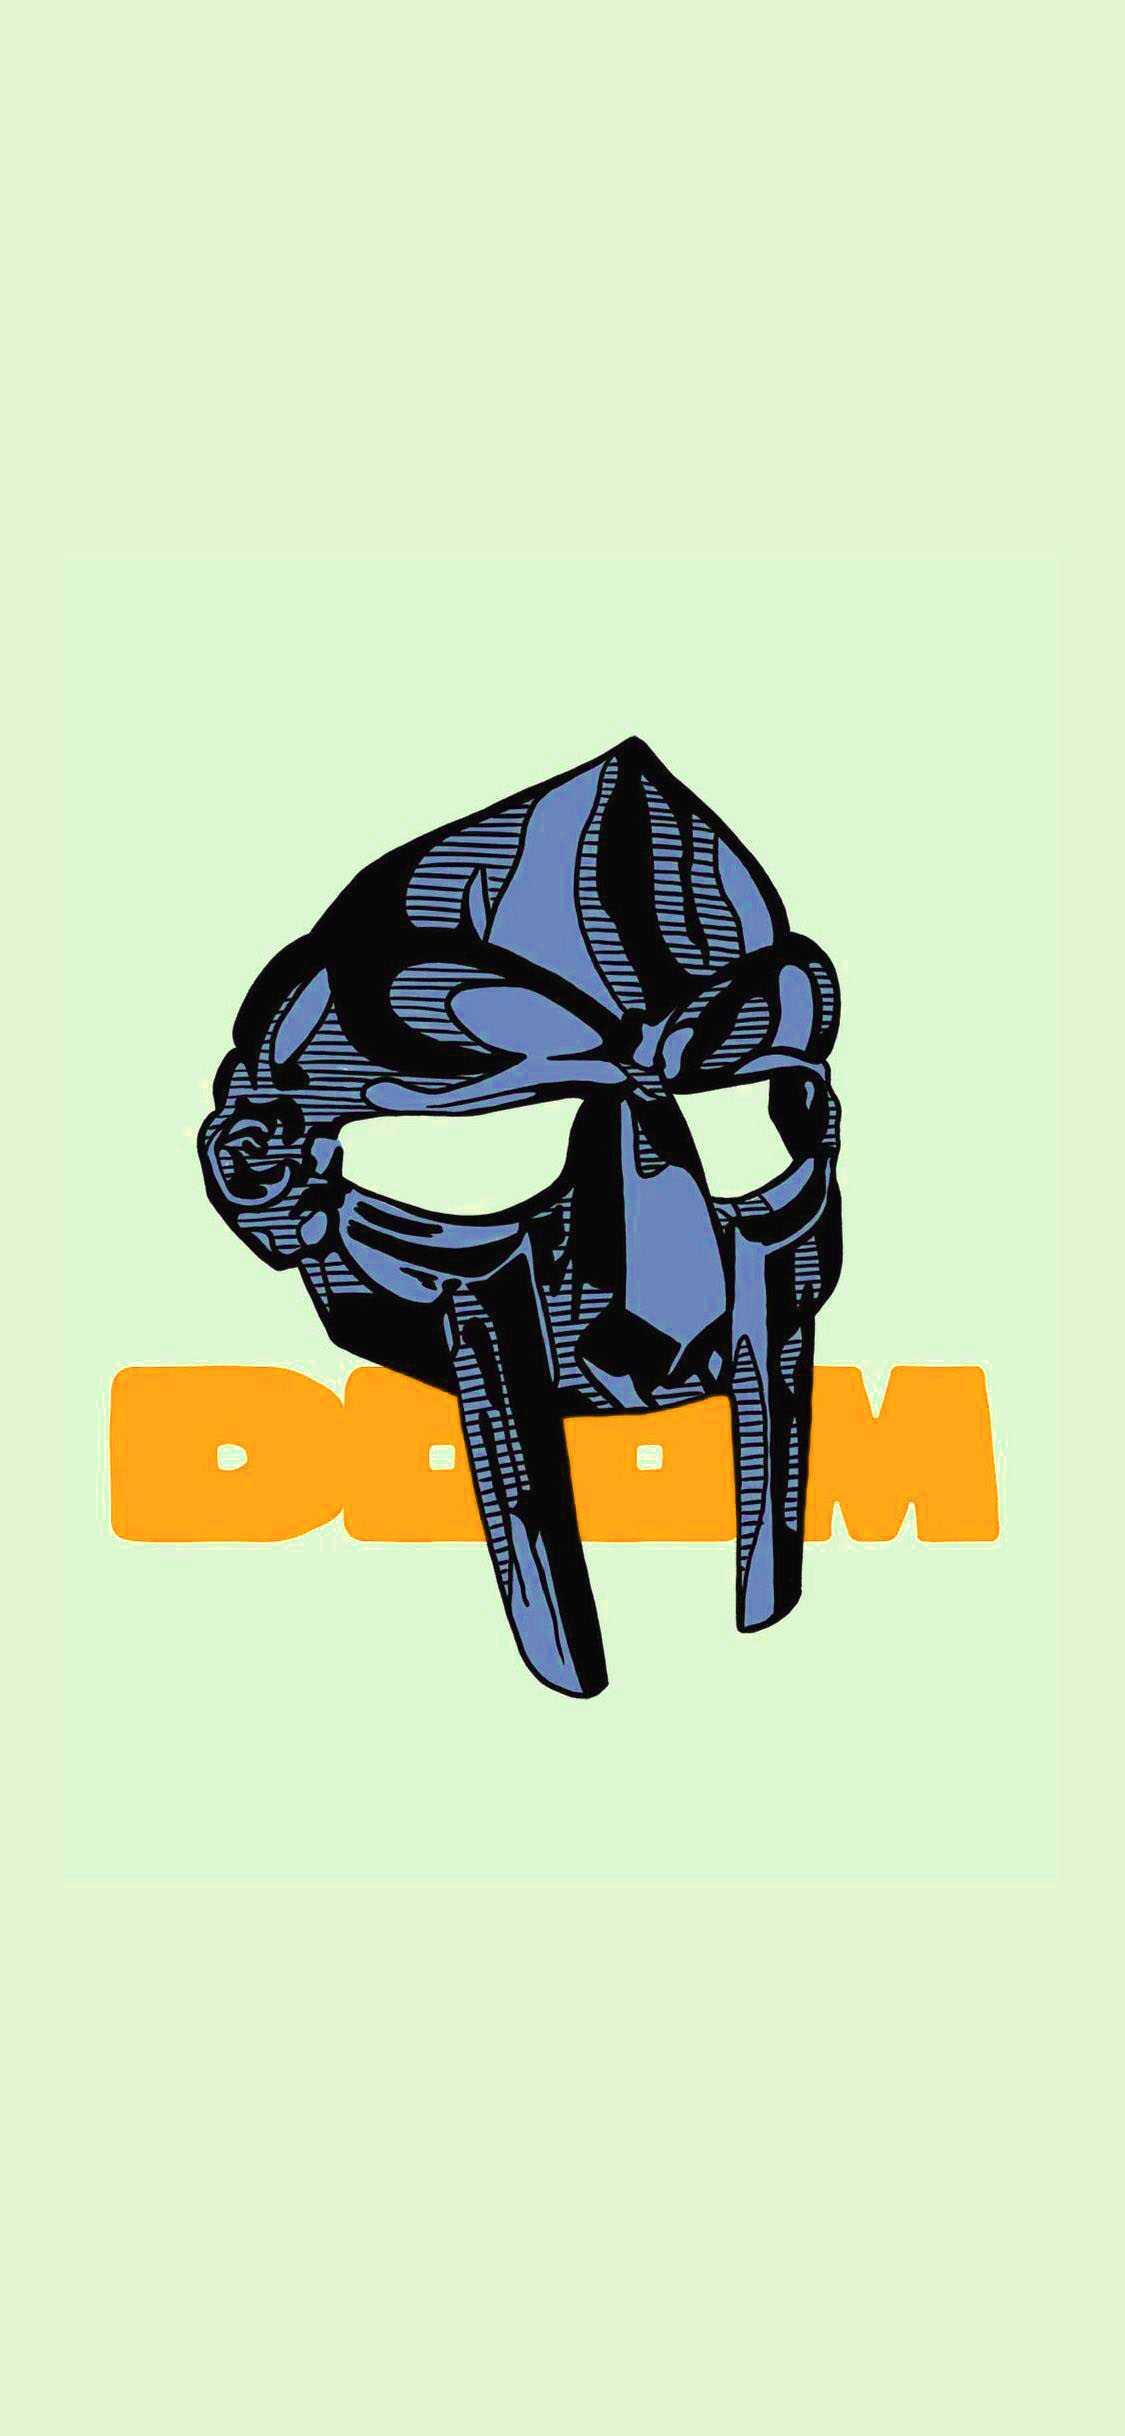 MF Doom Wallpaper iPhone - KoLPaPer - Awesome Free HD ...